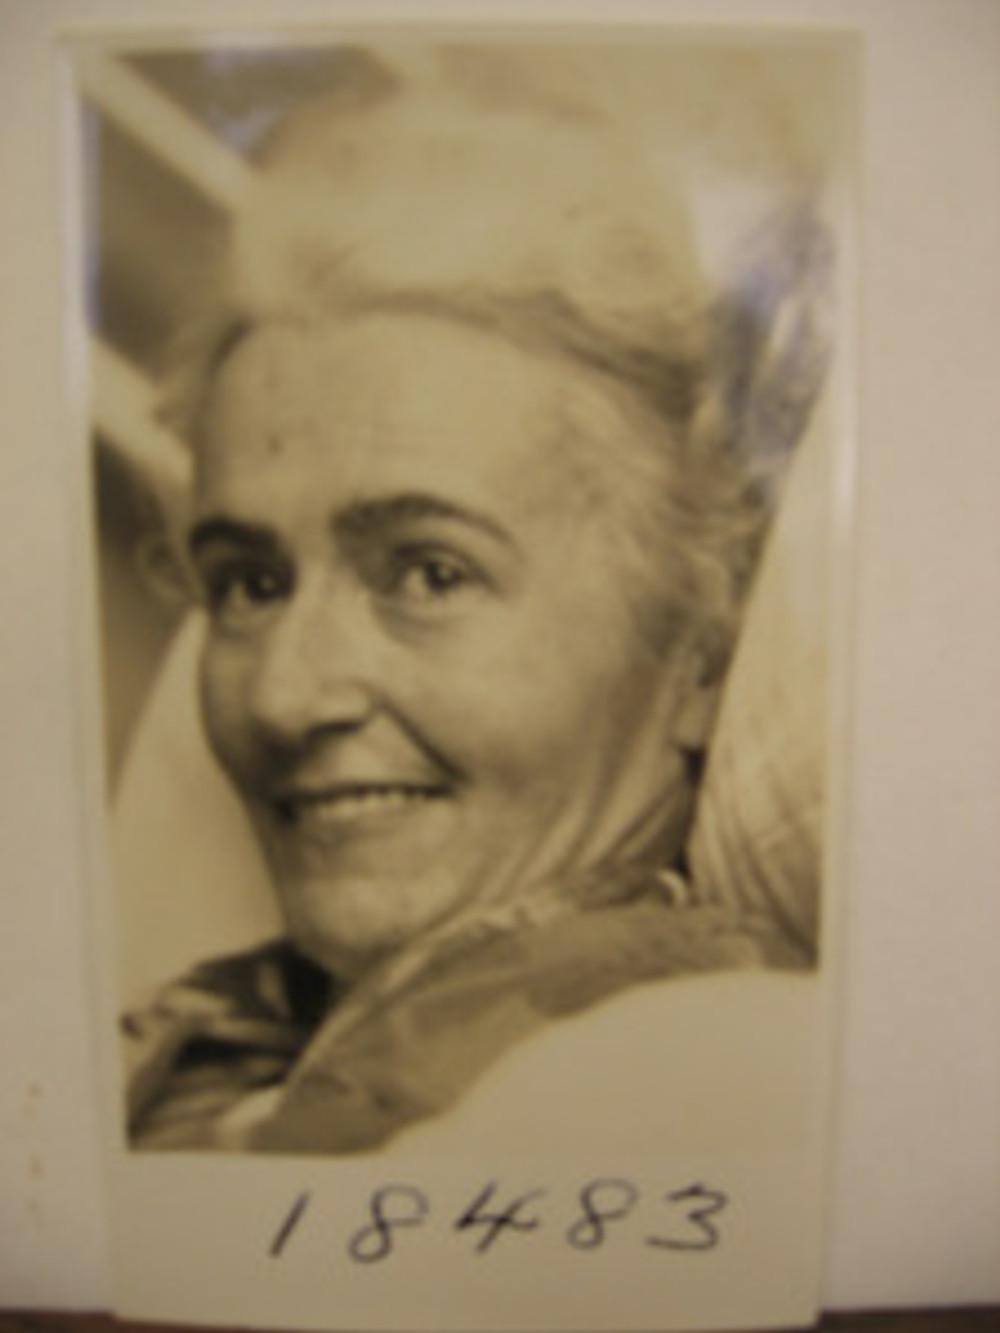 Mabel Malcolm